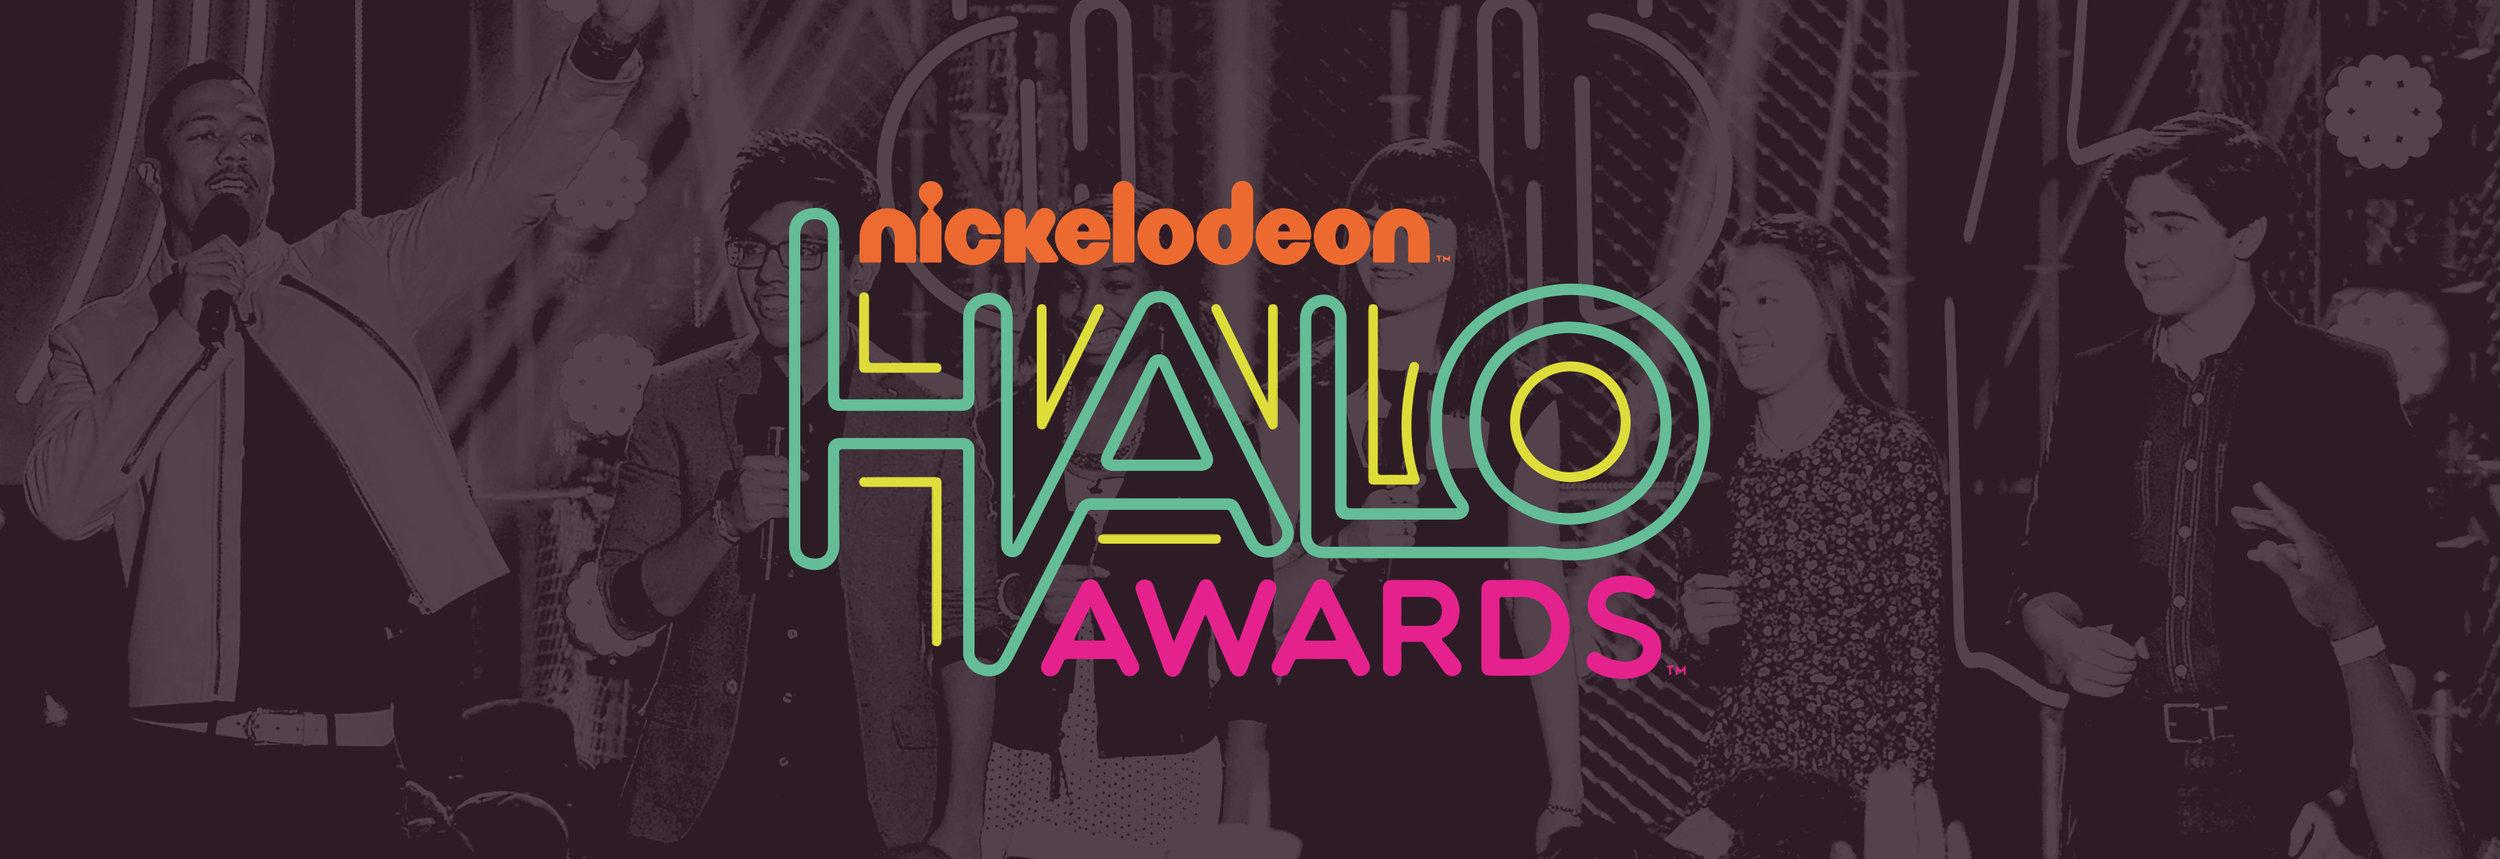 Nickelodeon HALO Award